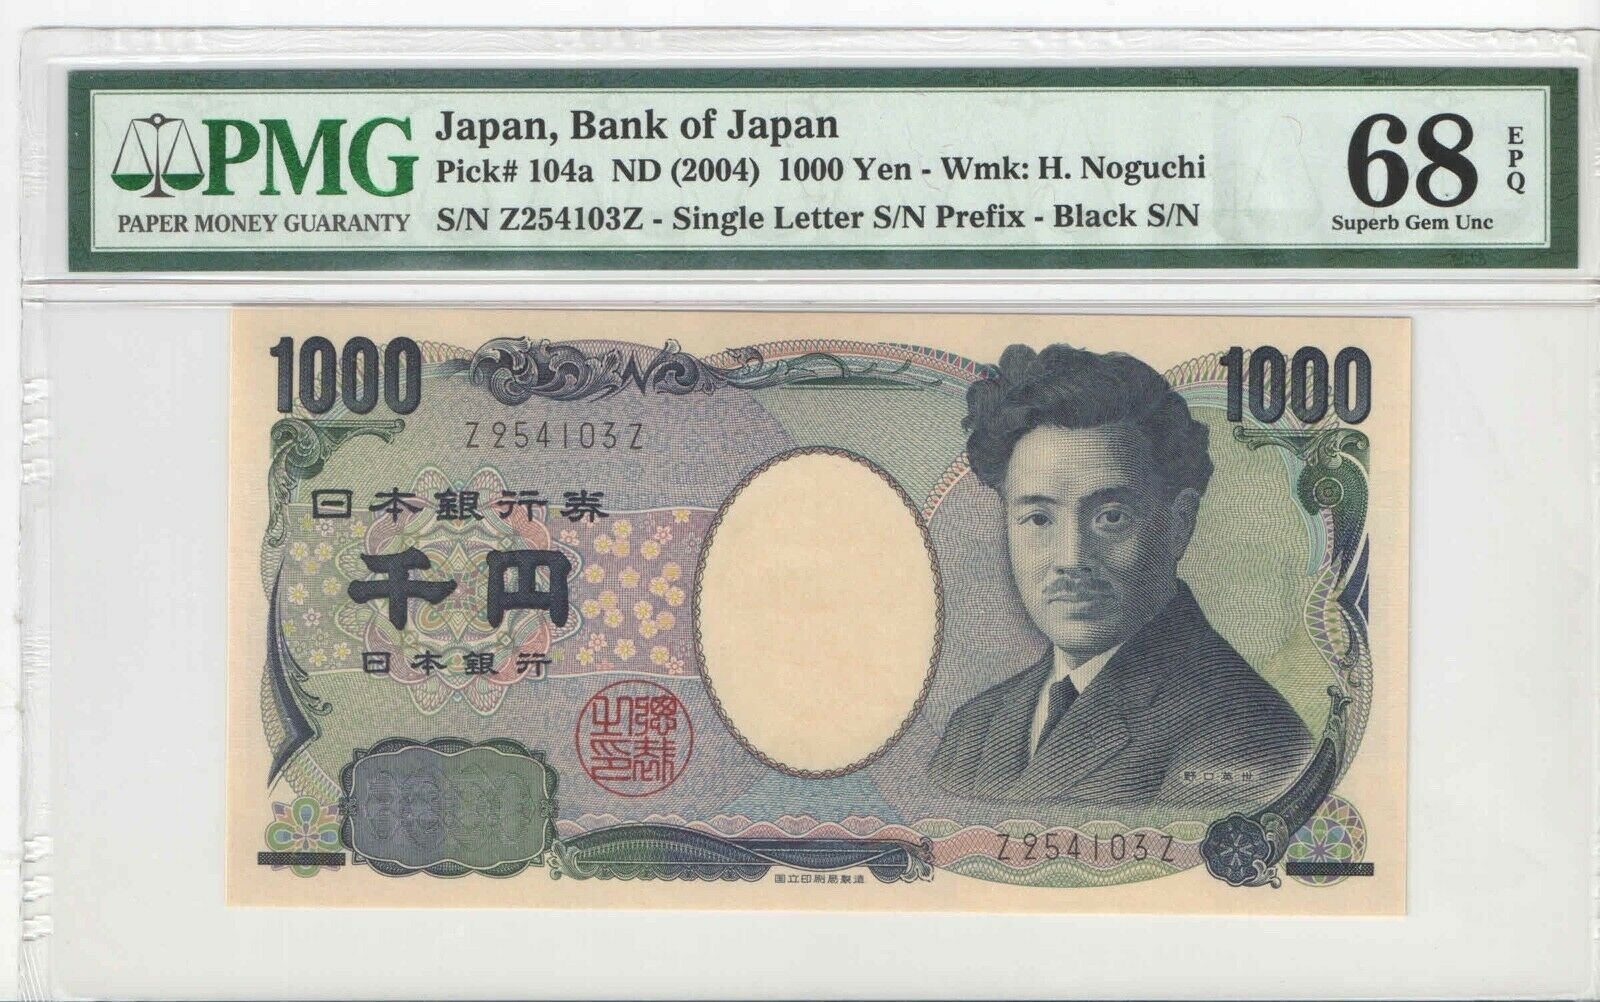 Japan 1000 Yen ND 2004 P 104a Bnk of Japan REPLACEMENT PMG 68EPQ.jpg